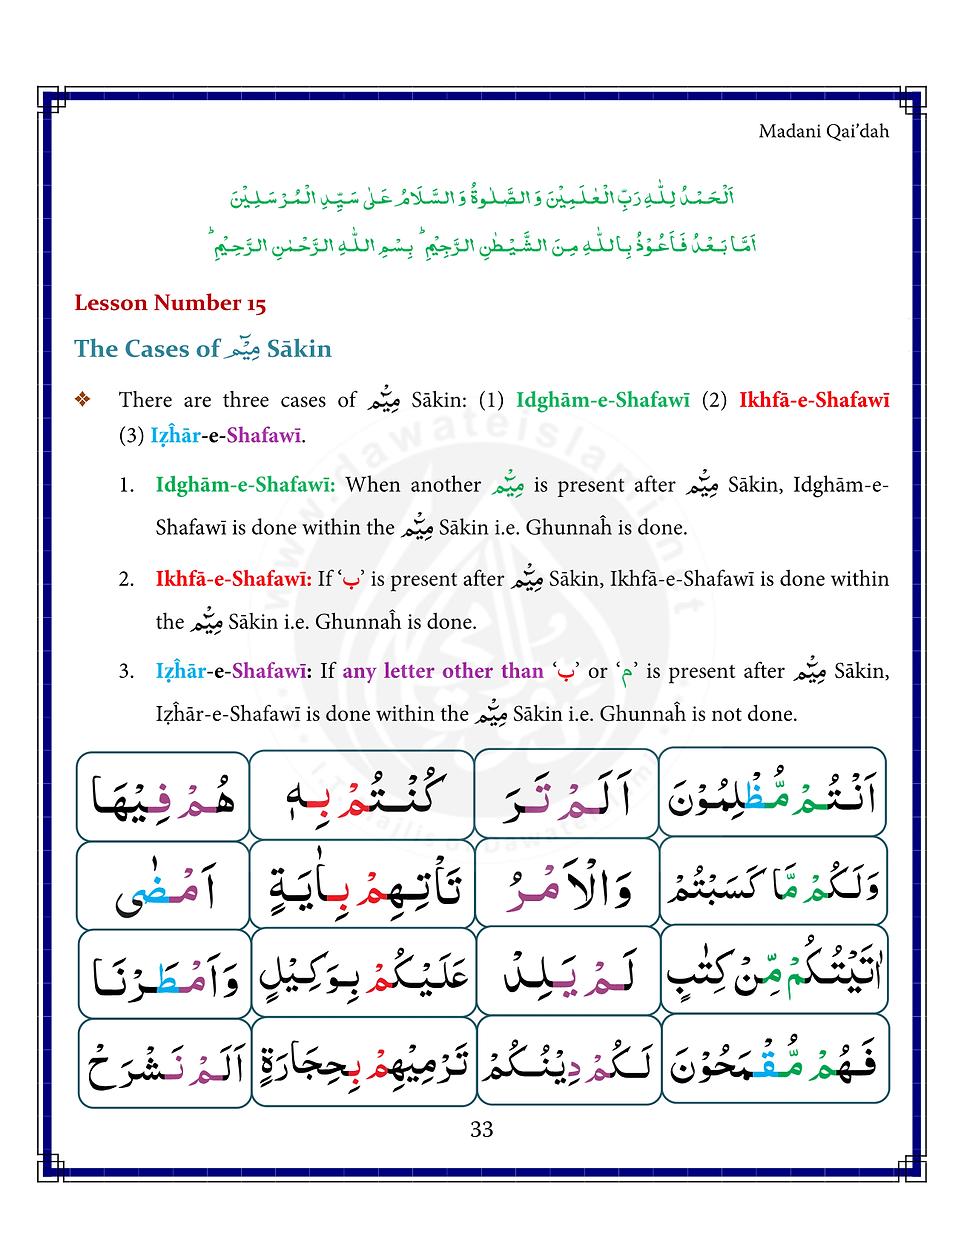 Madani Qaidah-43.png